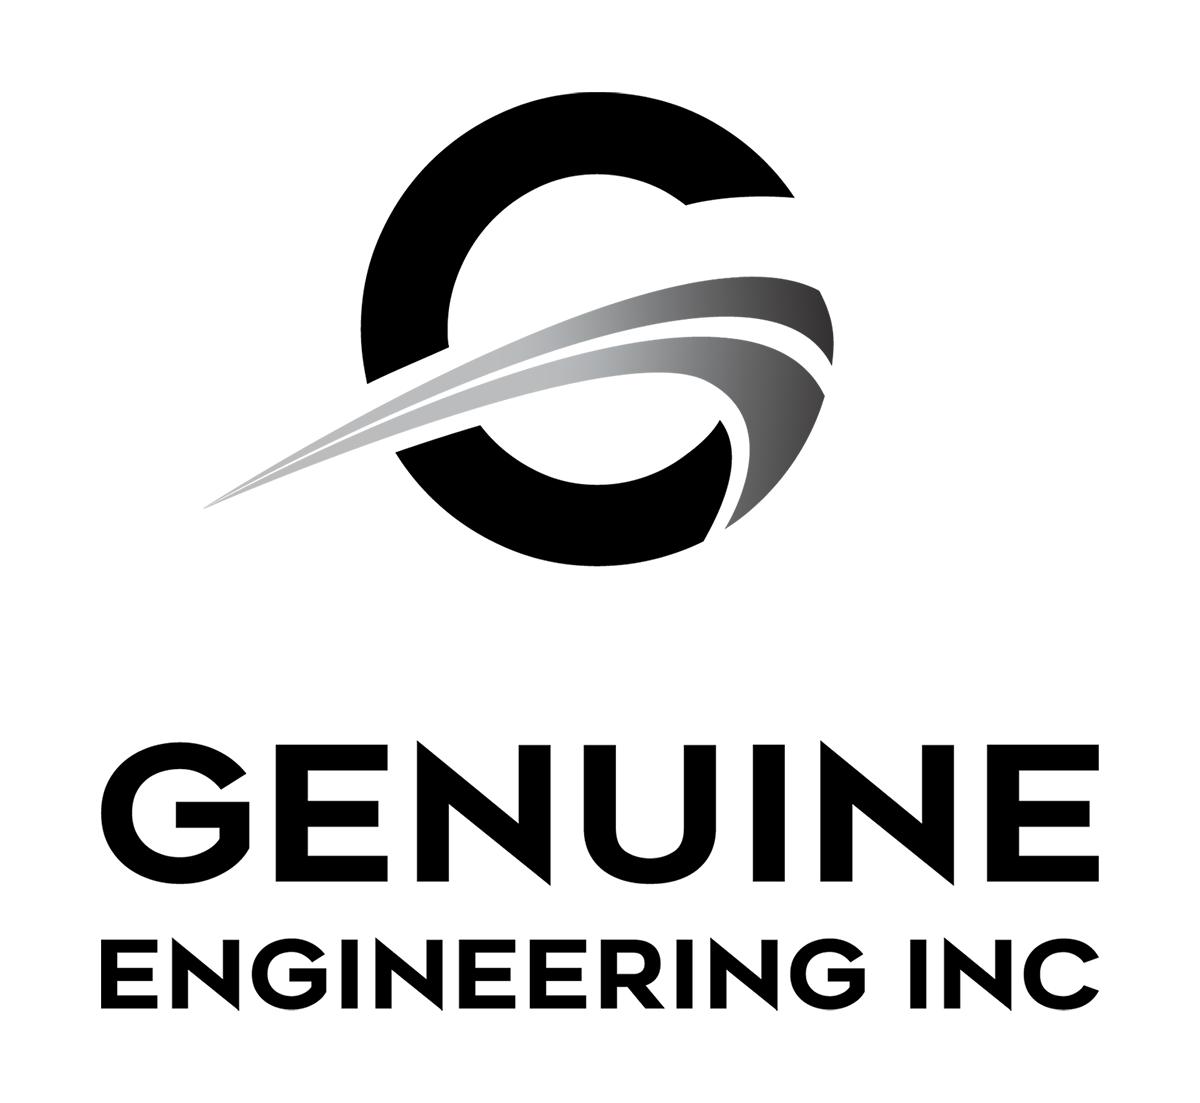 Genuine Engineering, Inc.